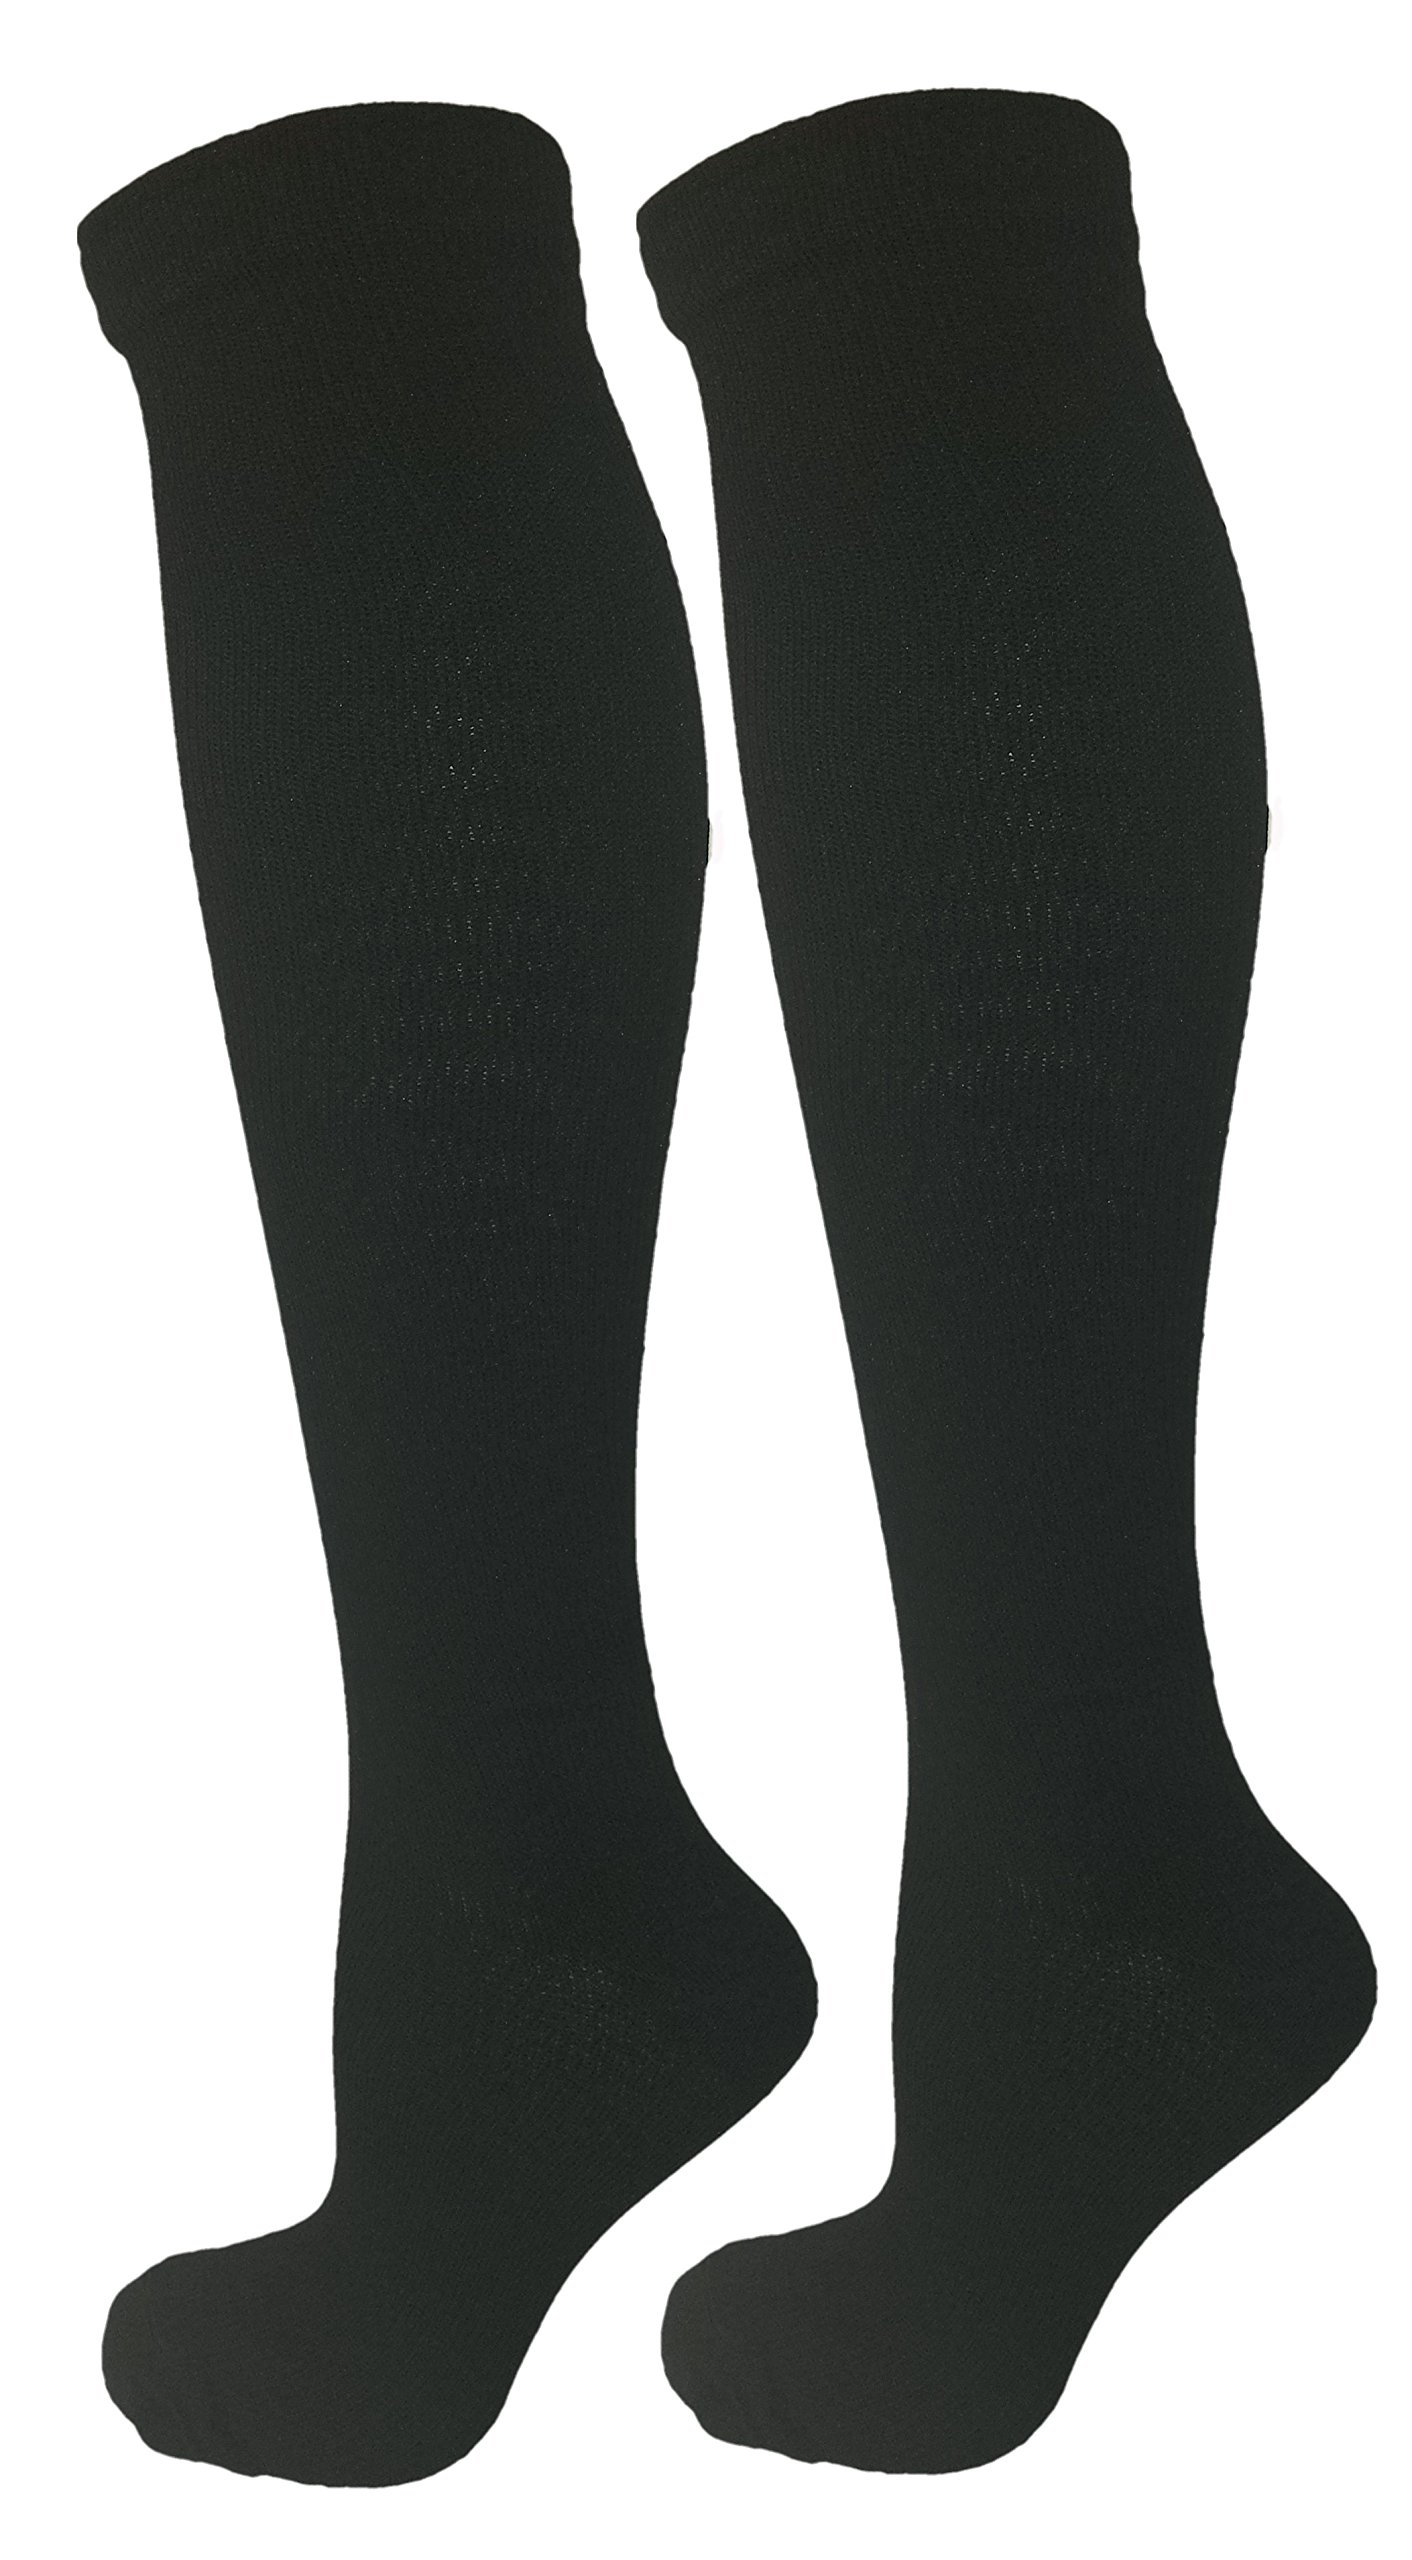 46b0f7511c5 Amazon.com  2 Pair Navy Blue Small Medium Ladies Compression Socks ...